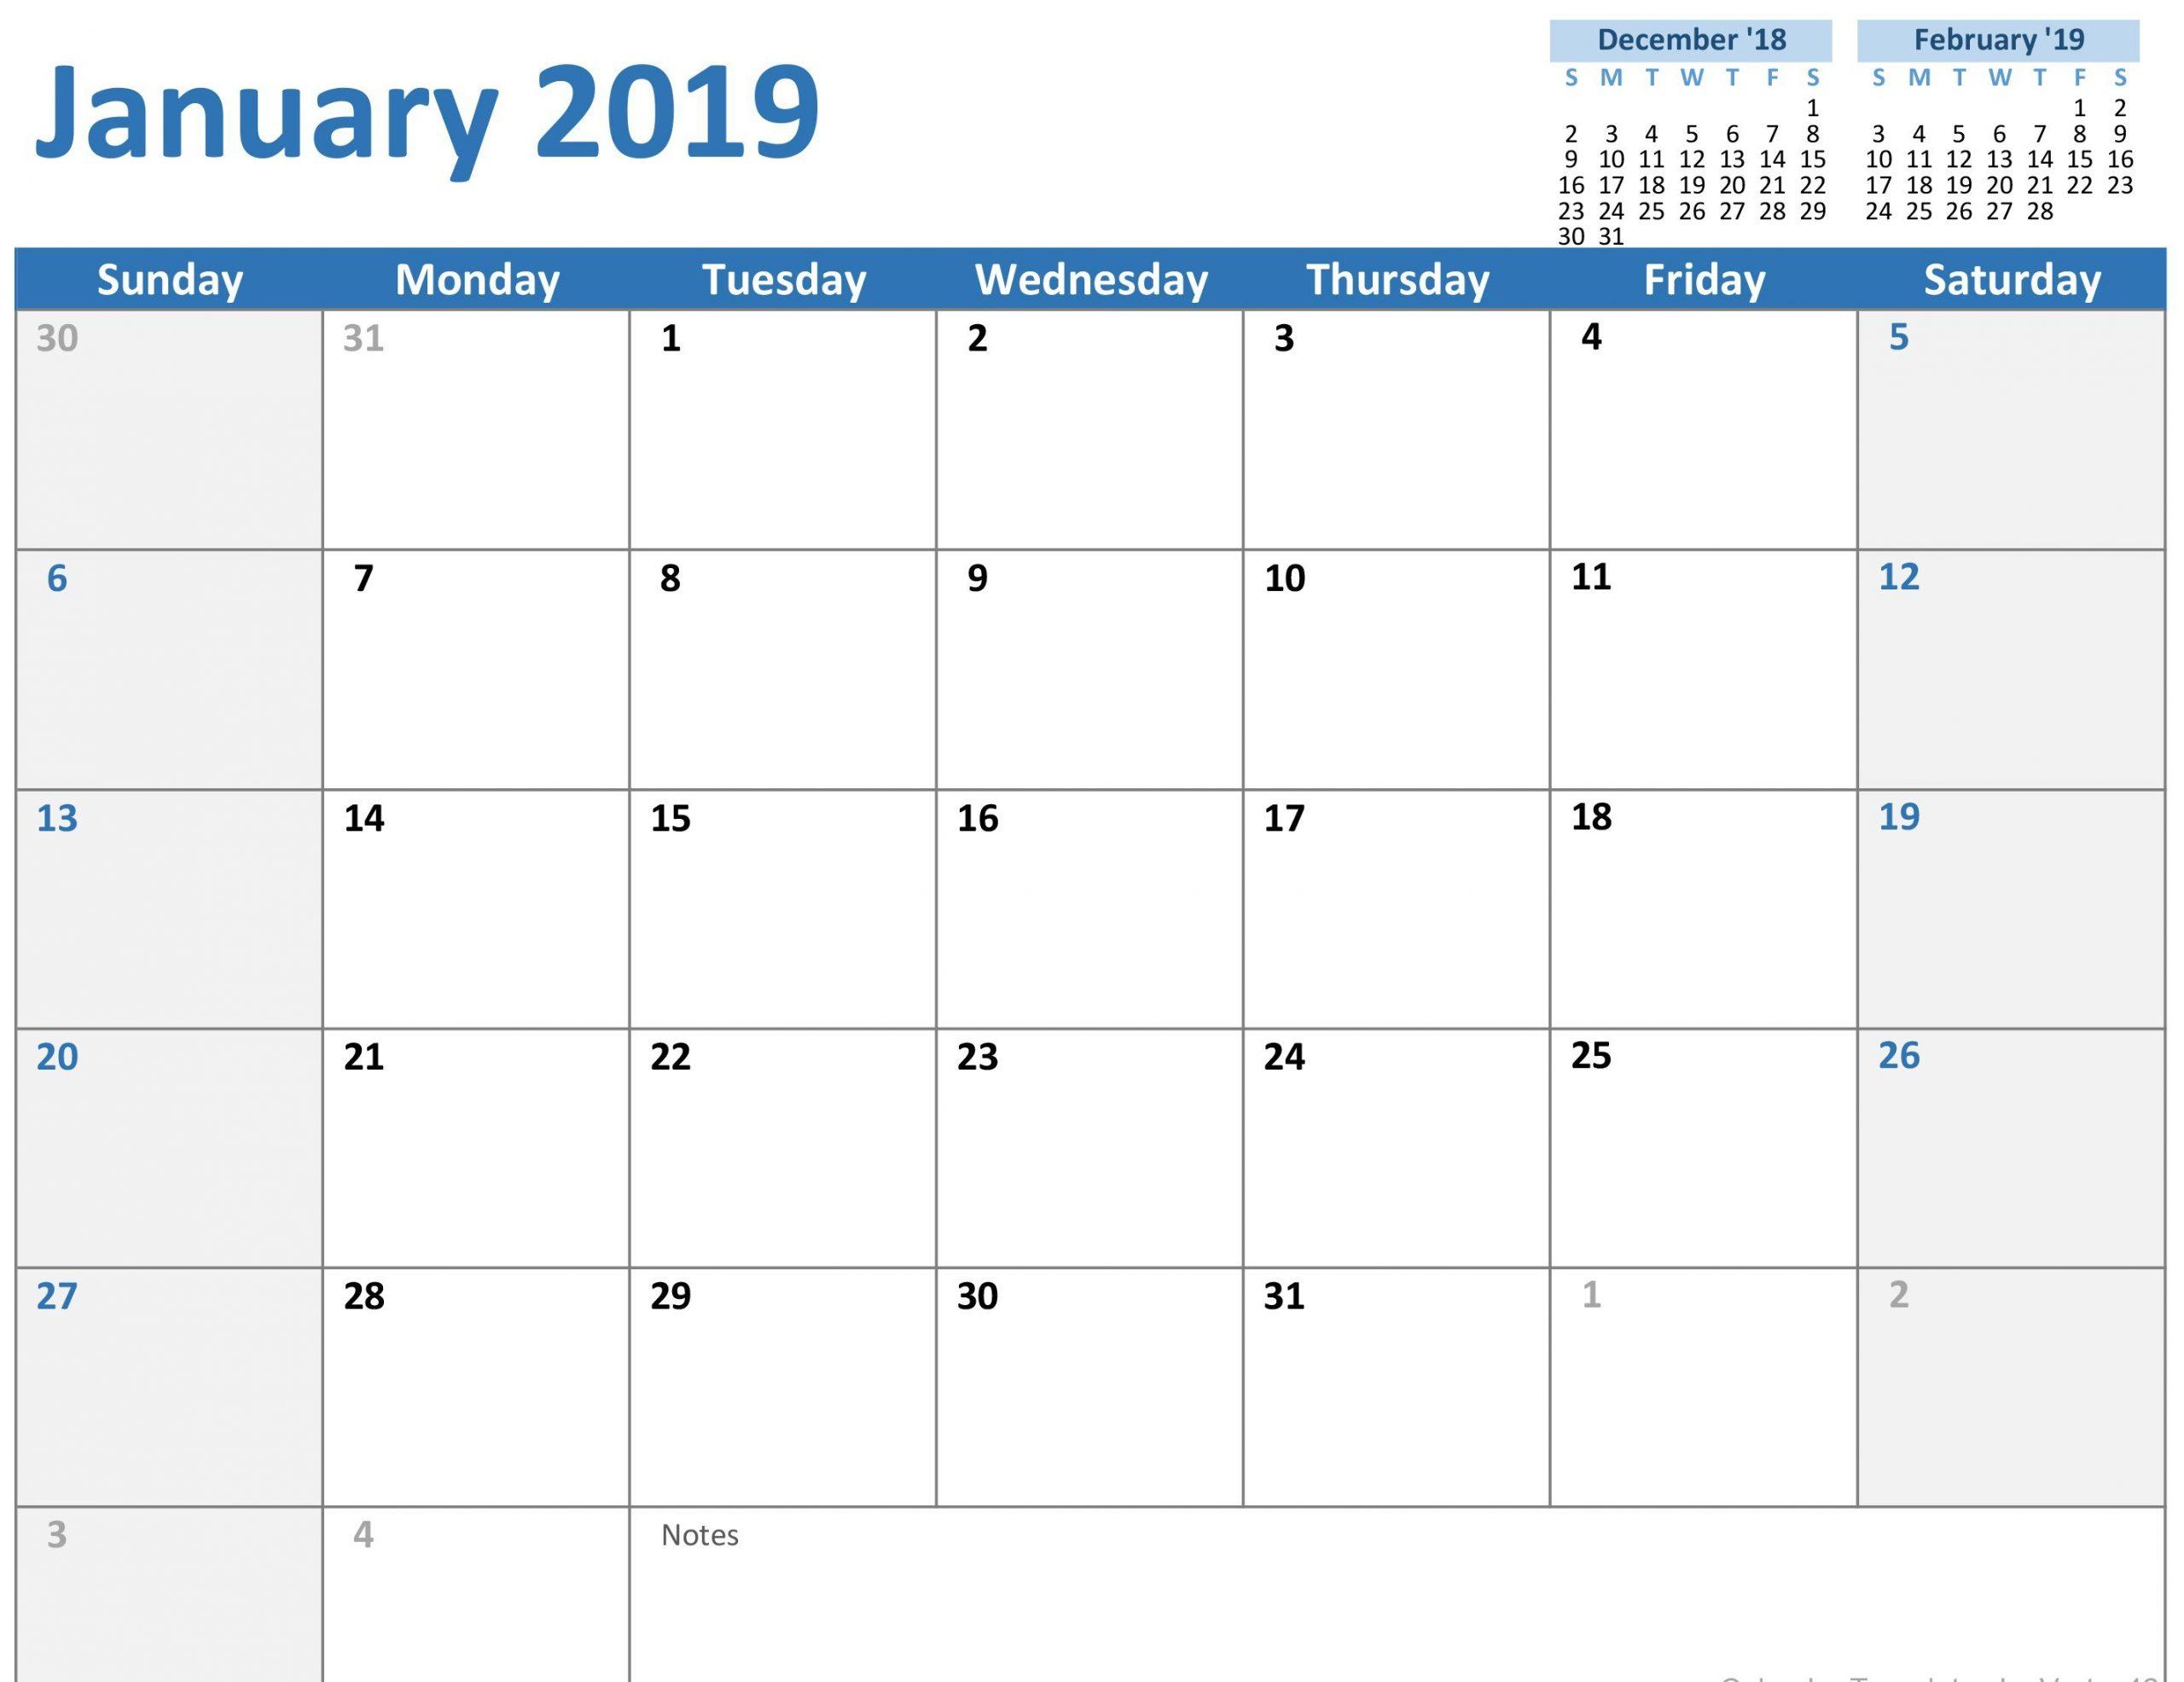 2020 Calender I Can Edit   Calendar Template Printable Free Calendars That I Can Edit And Print